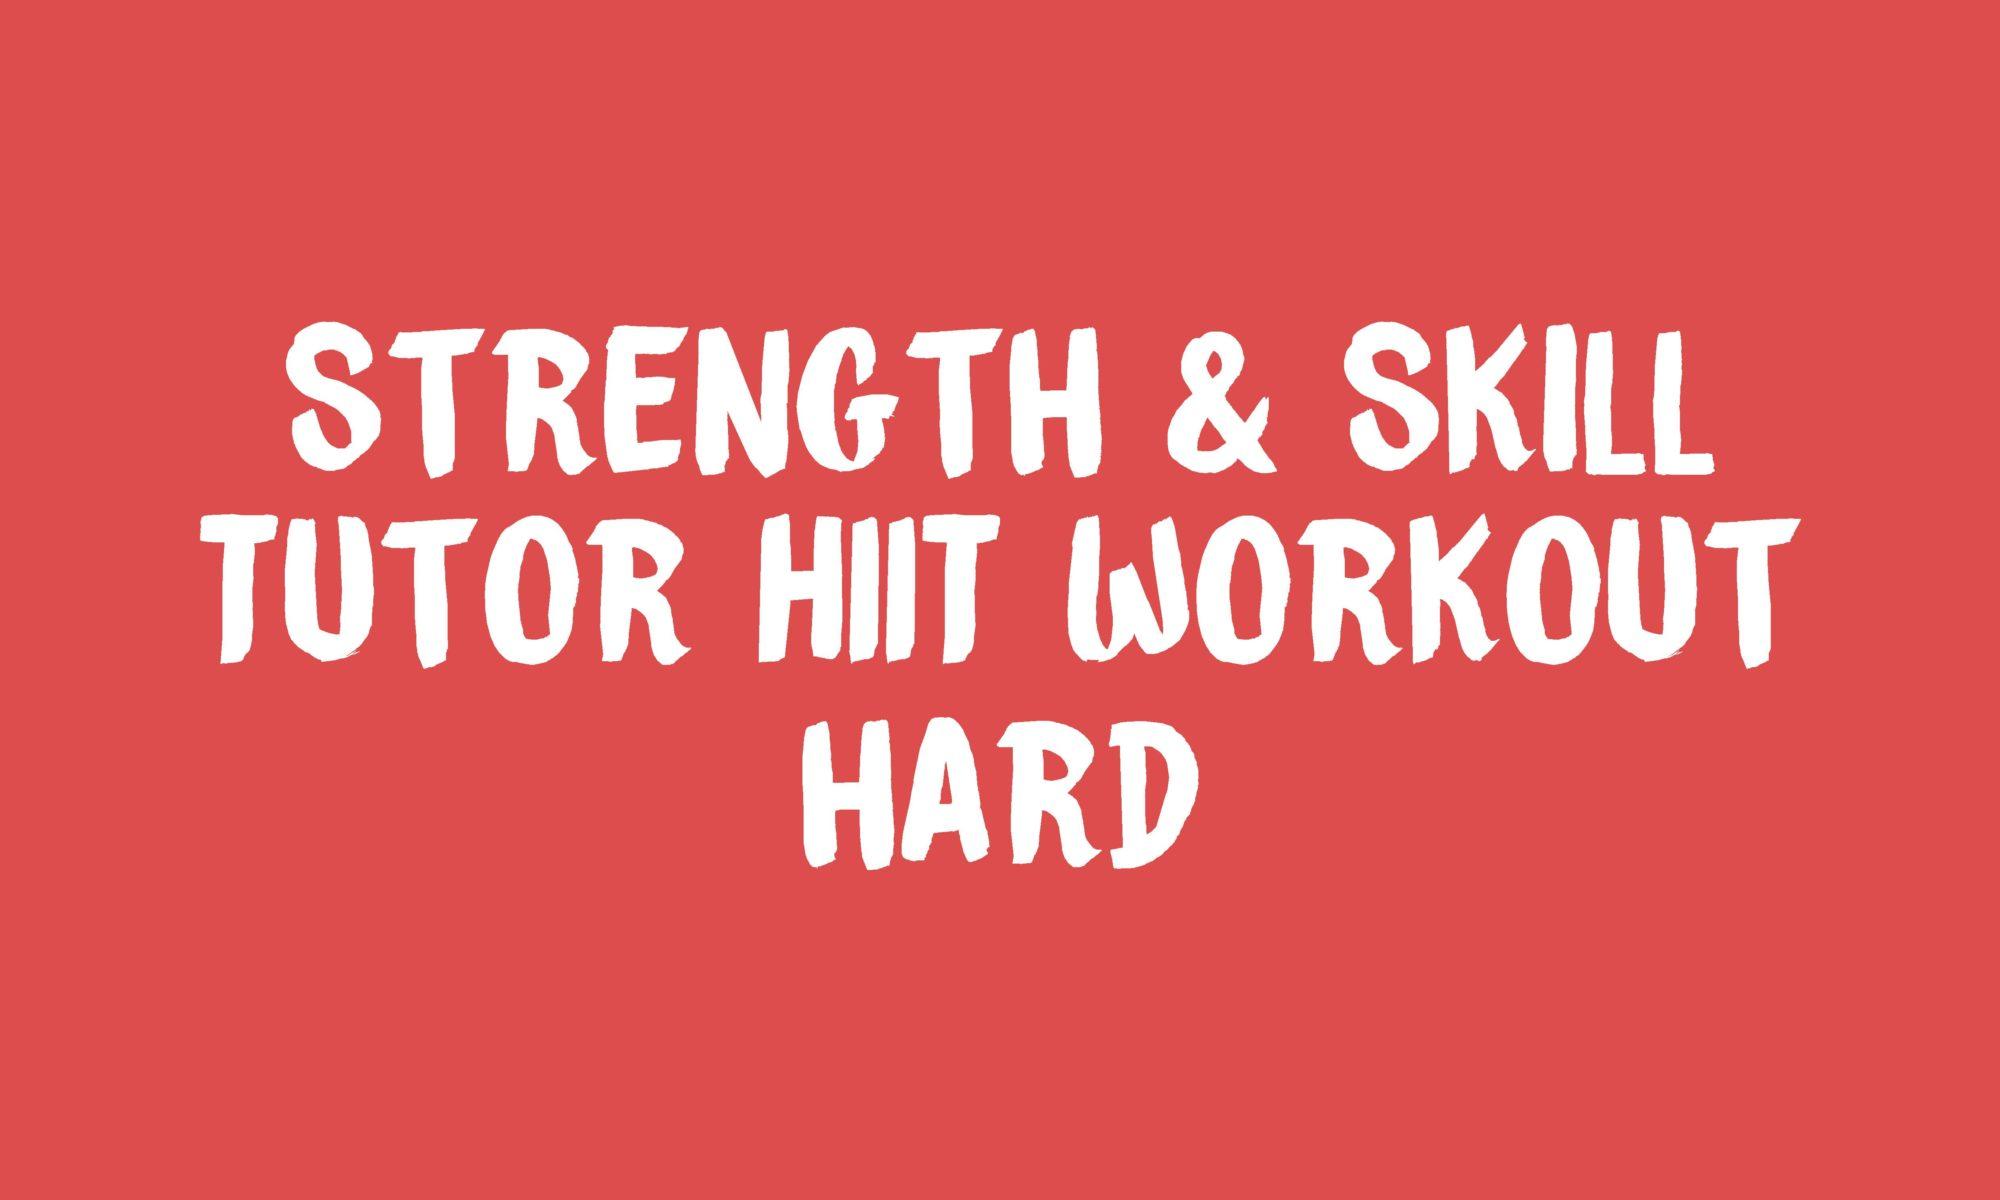 Tutor HIIT workout Banner